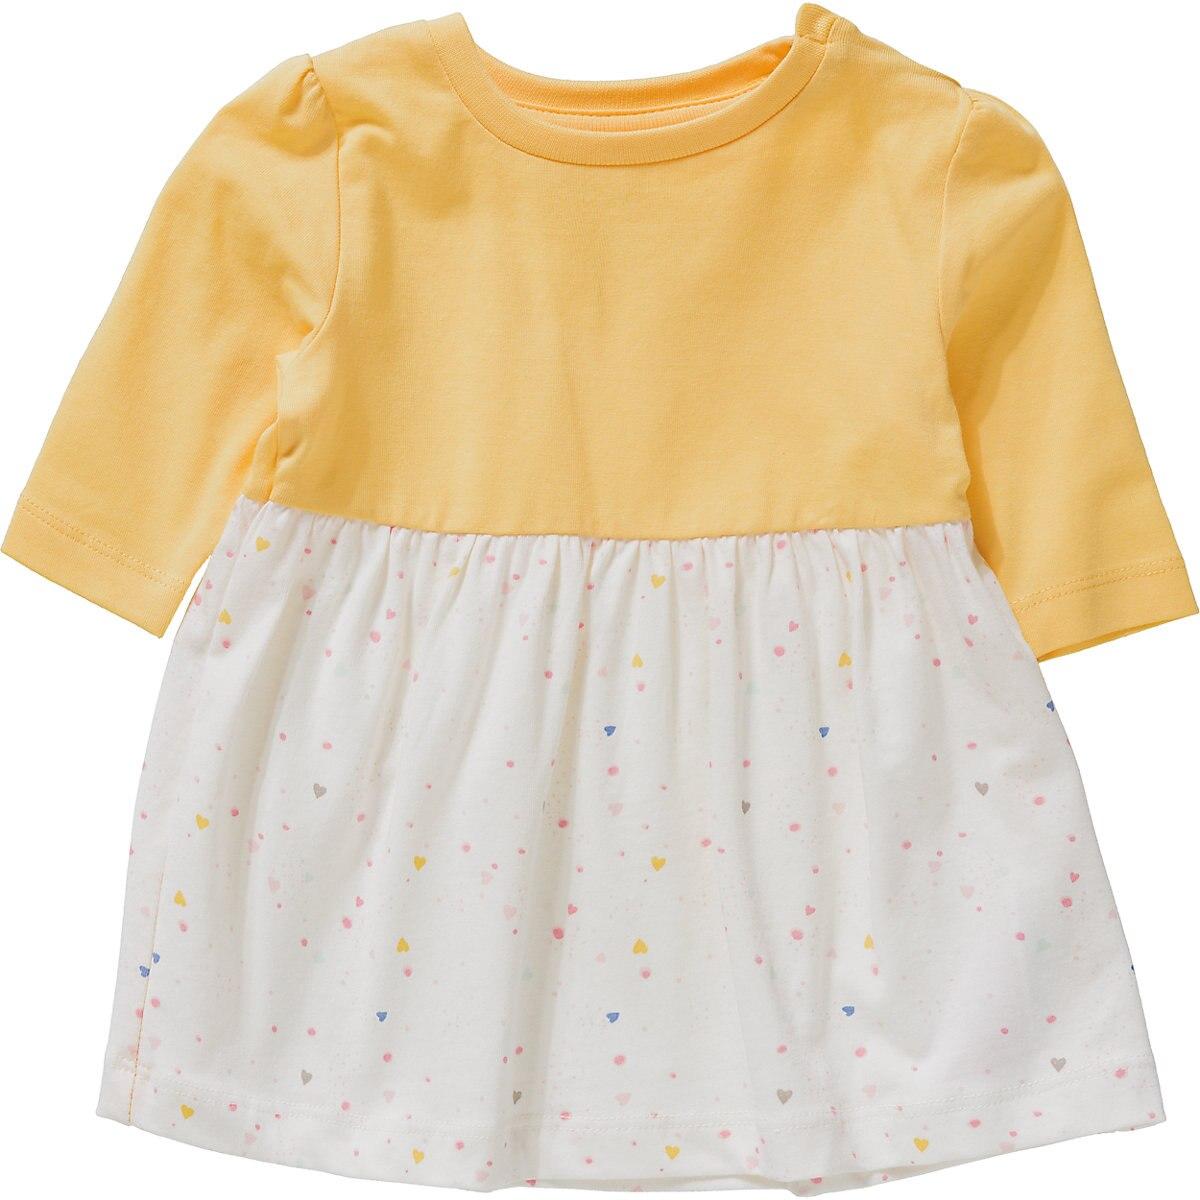 Фото - NAME IT Dresses 10623729 dress for girls baby clothing name it dresses 10626724 dress for girls baby clothing